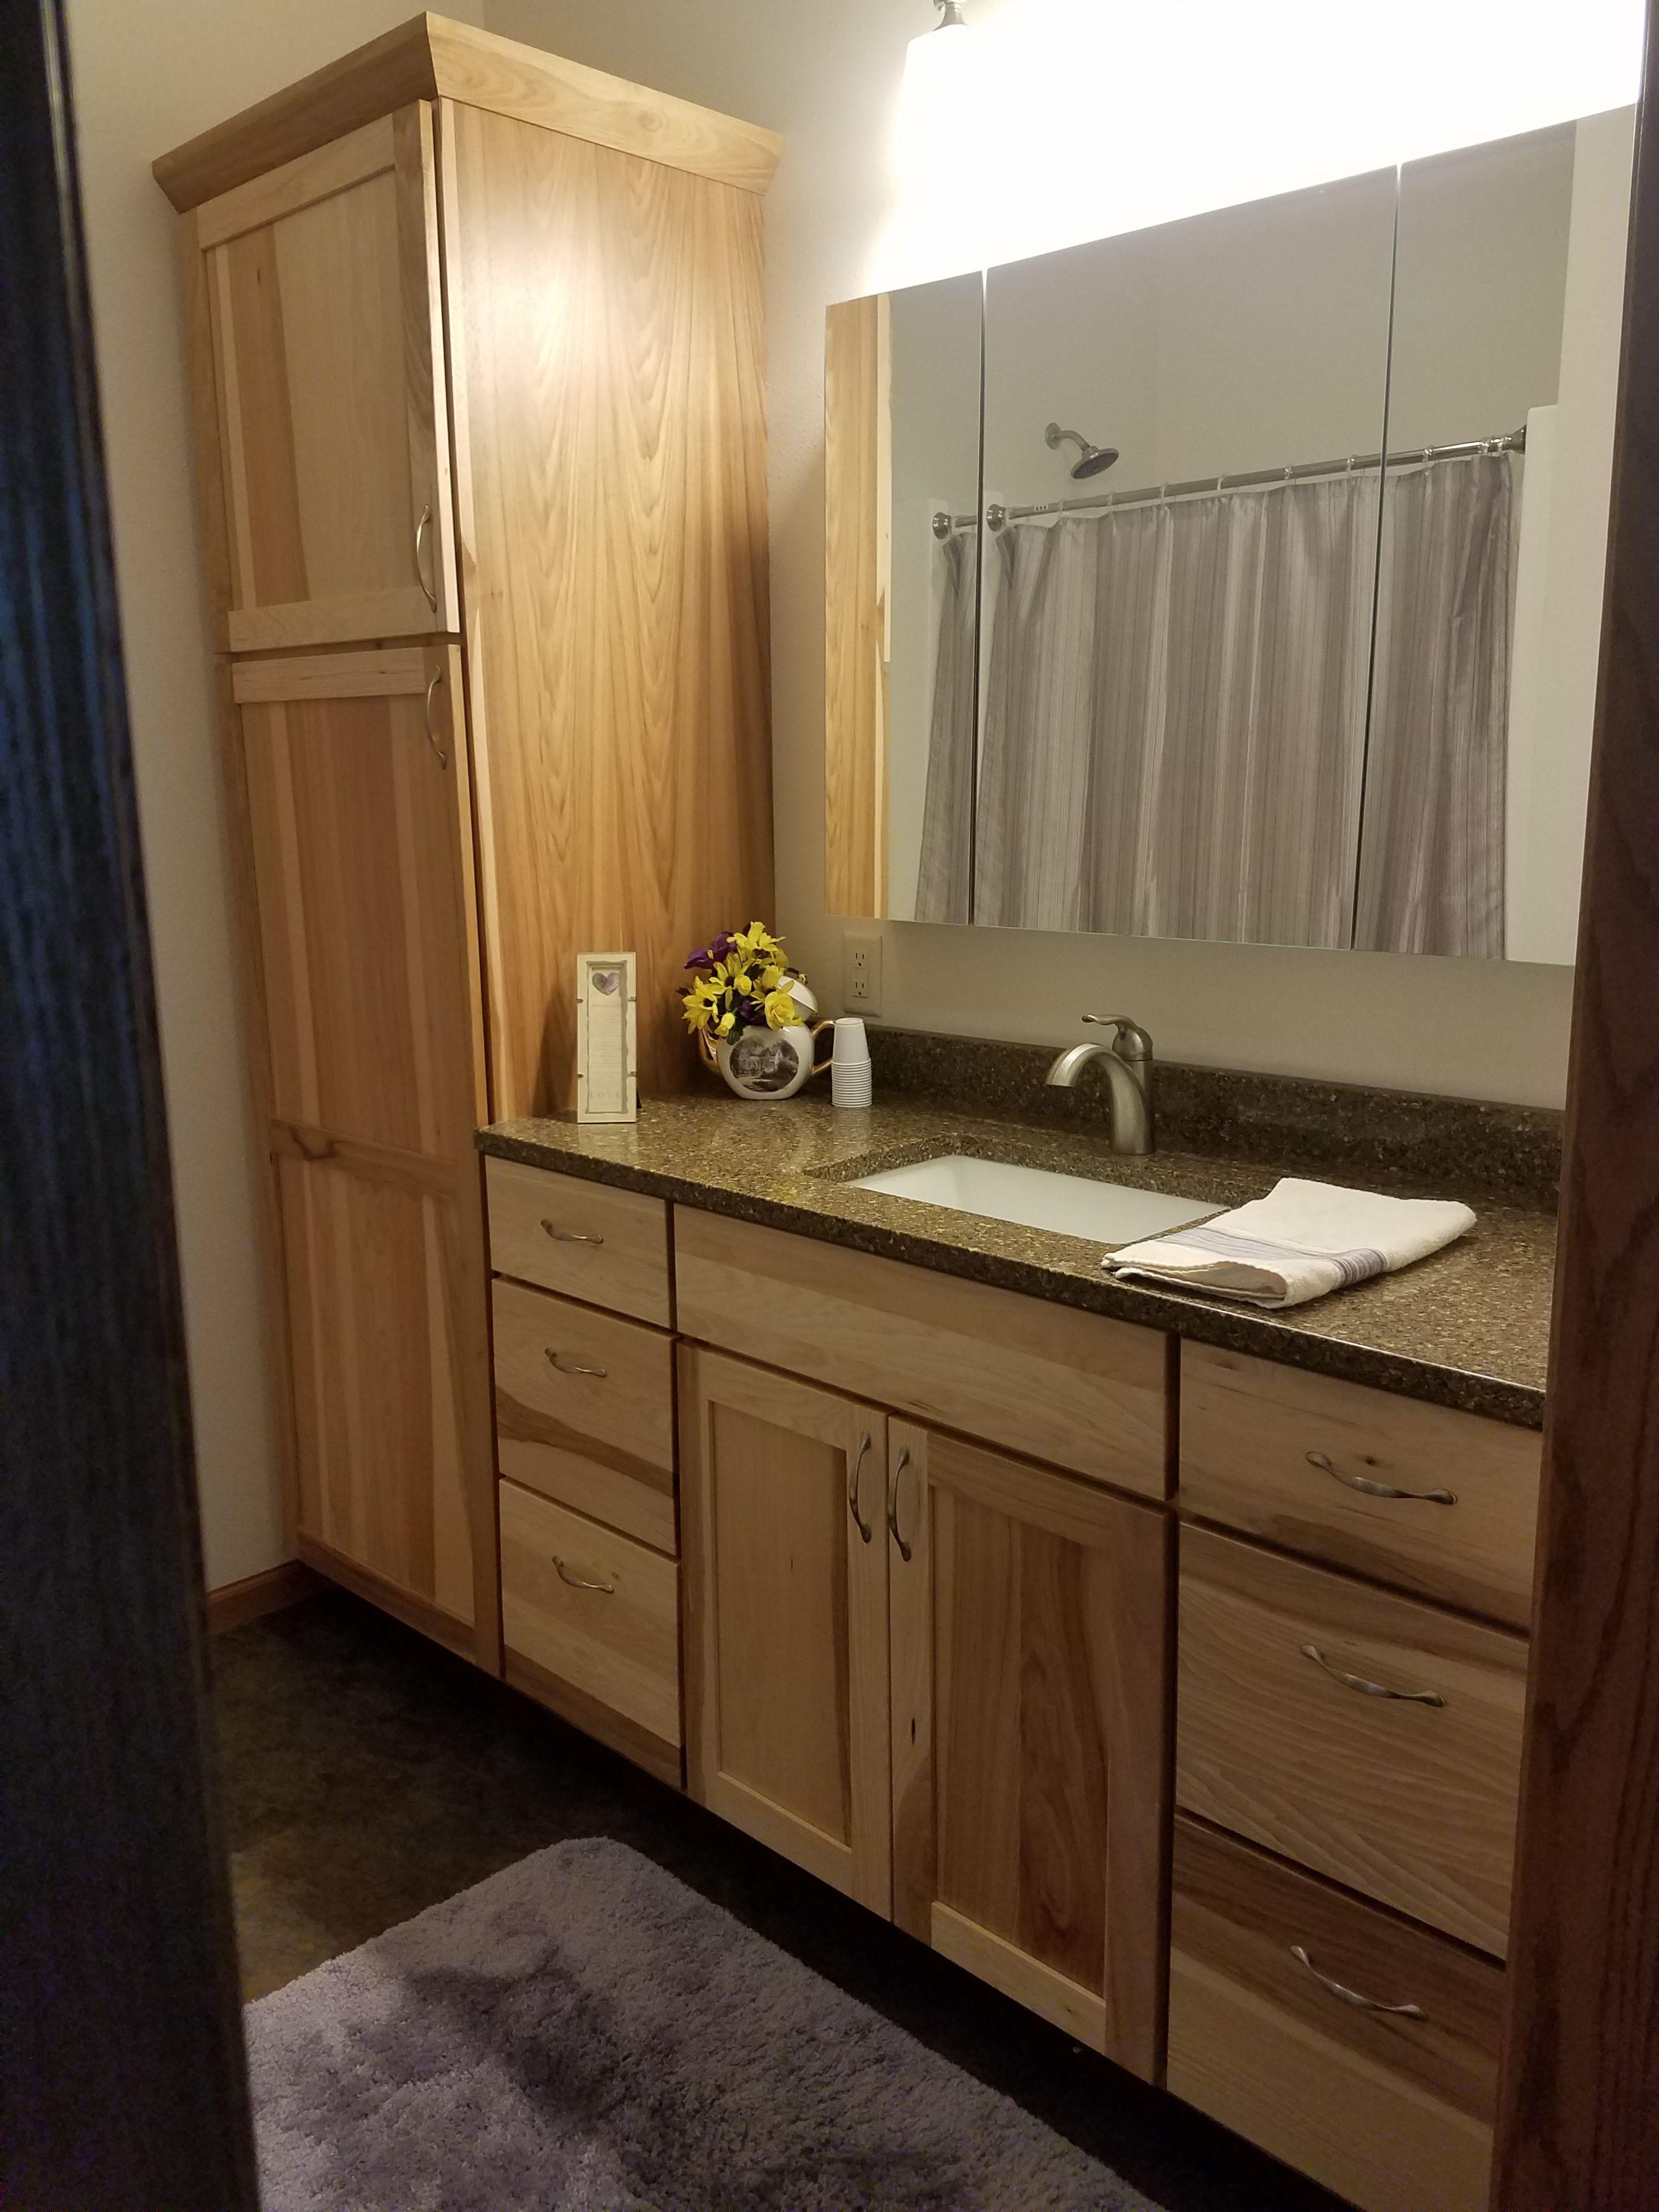 Natural Hickory Cabinets With A Quot Kilauea Quot Quartz